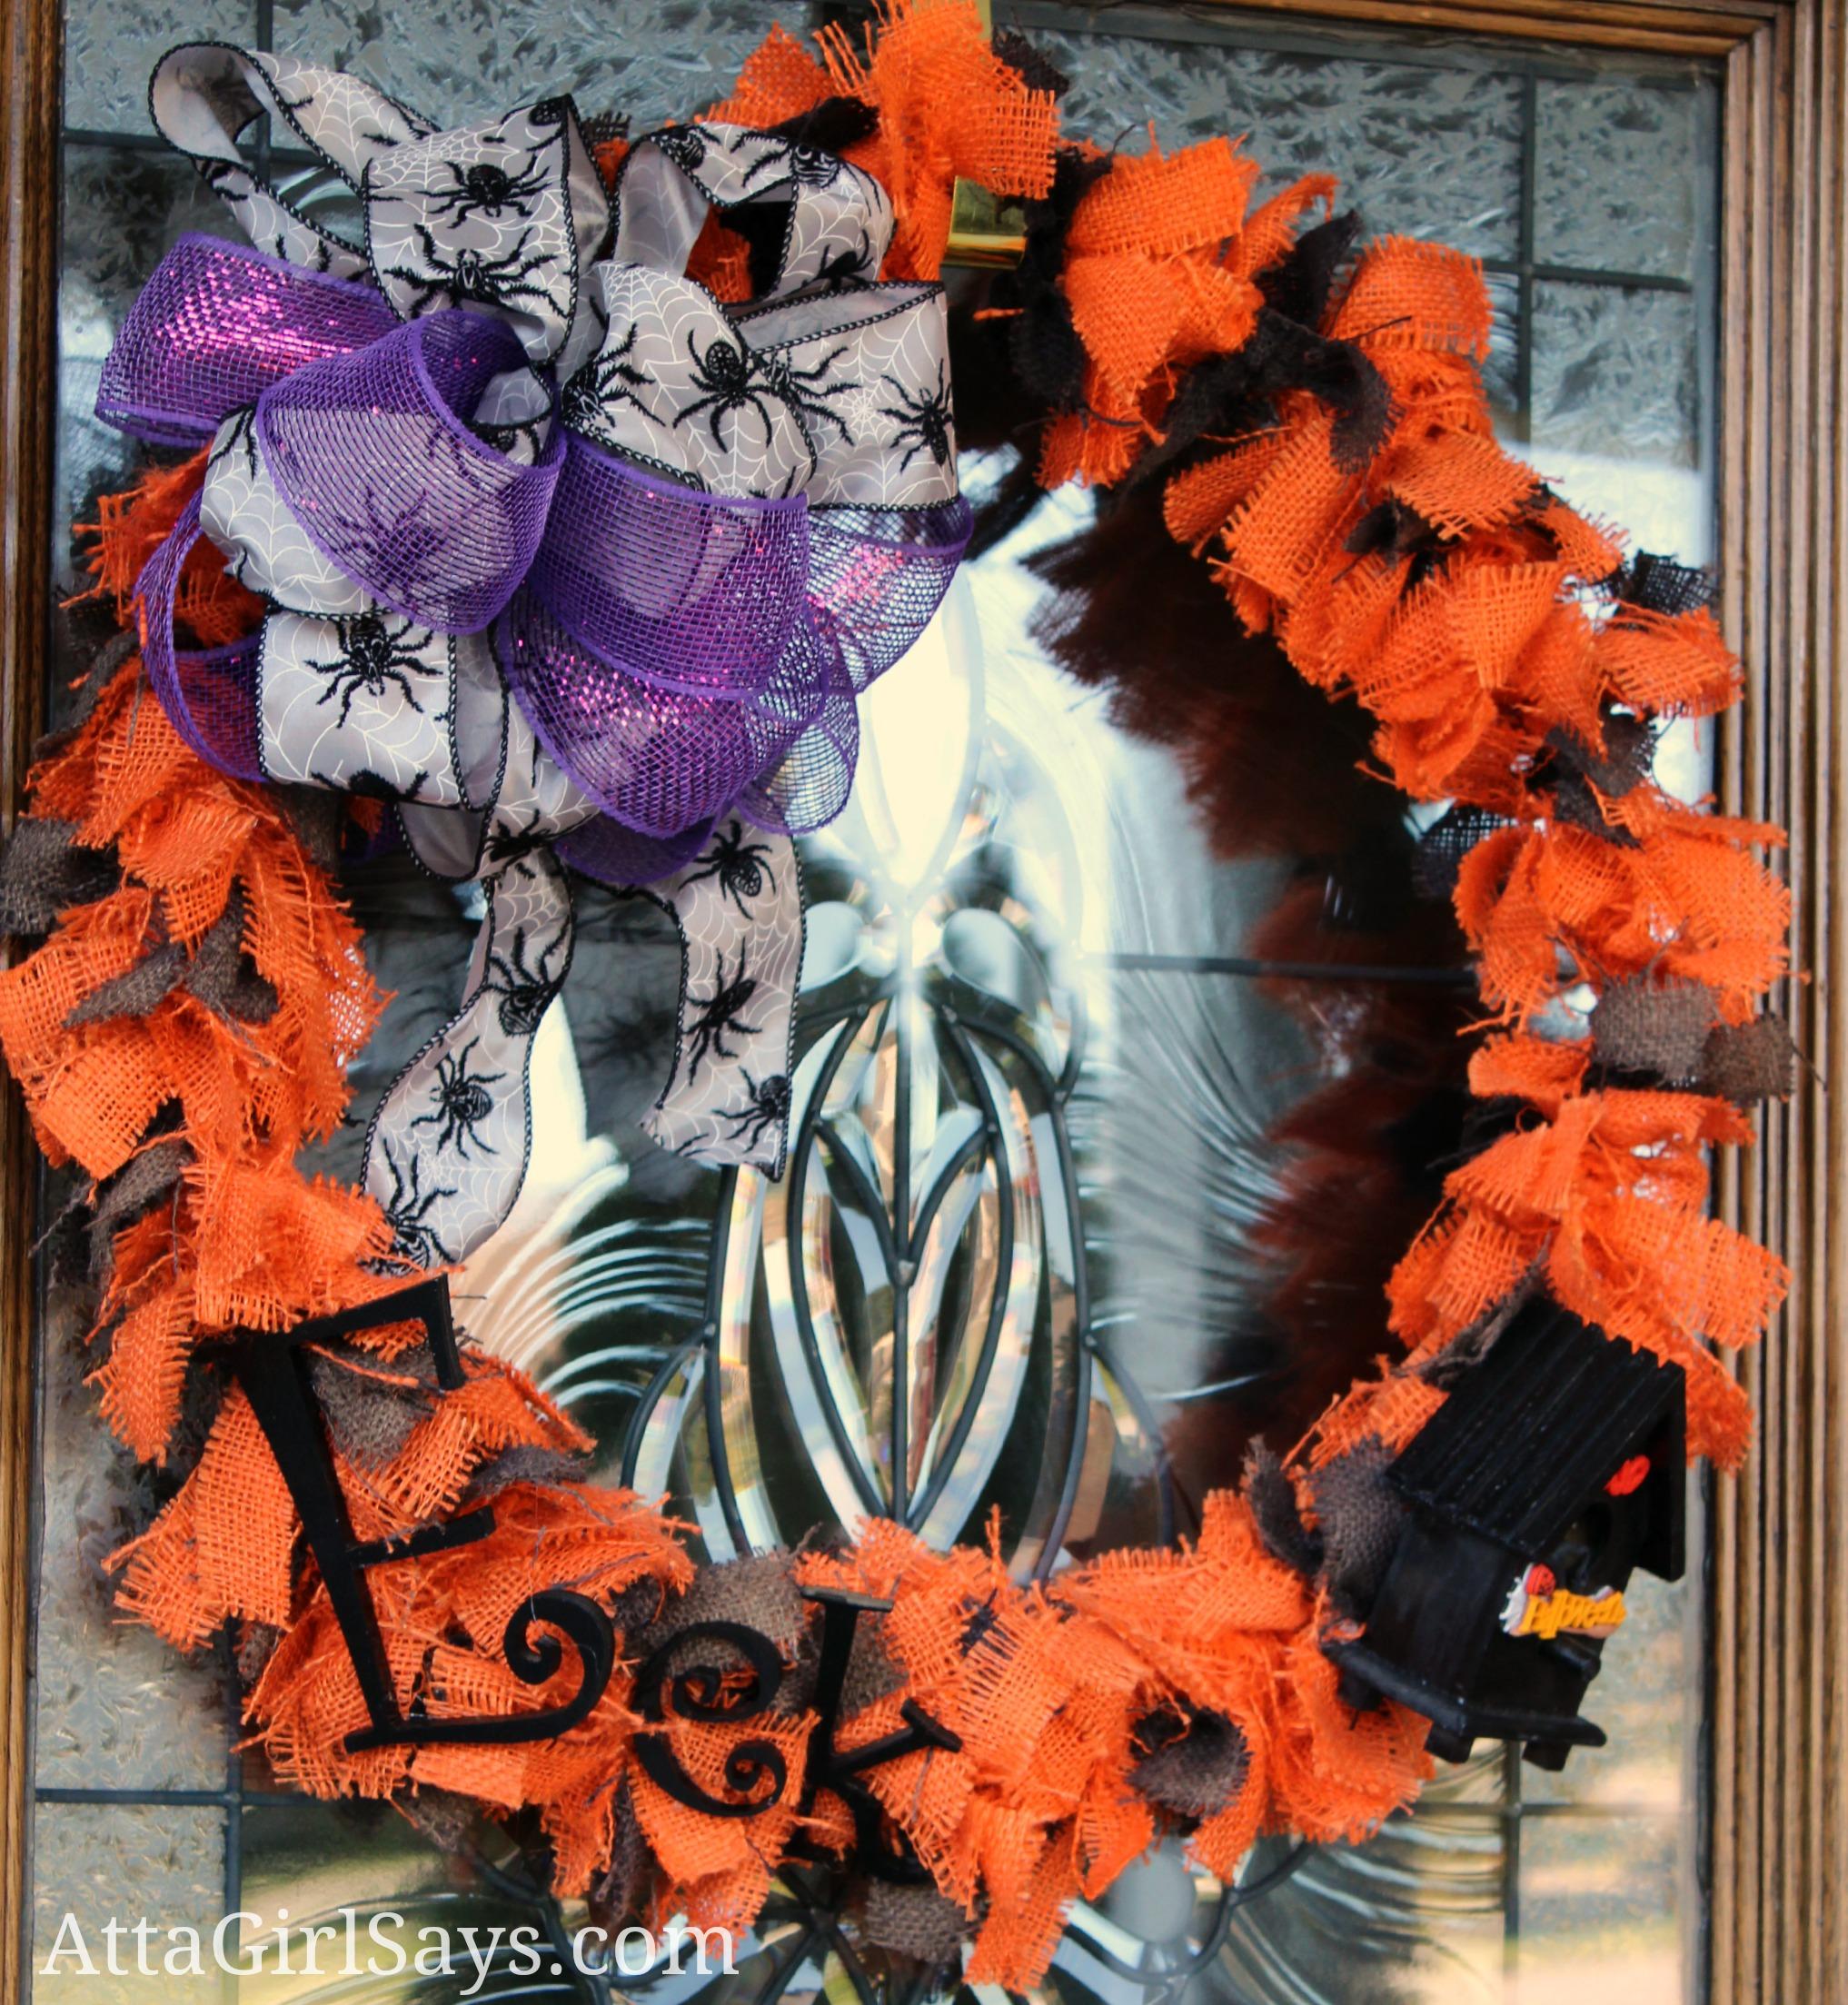 Orange and Black Burlap Halloween Rag Wreath by AttaGirlSays.com